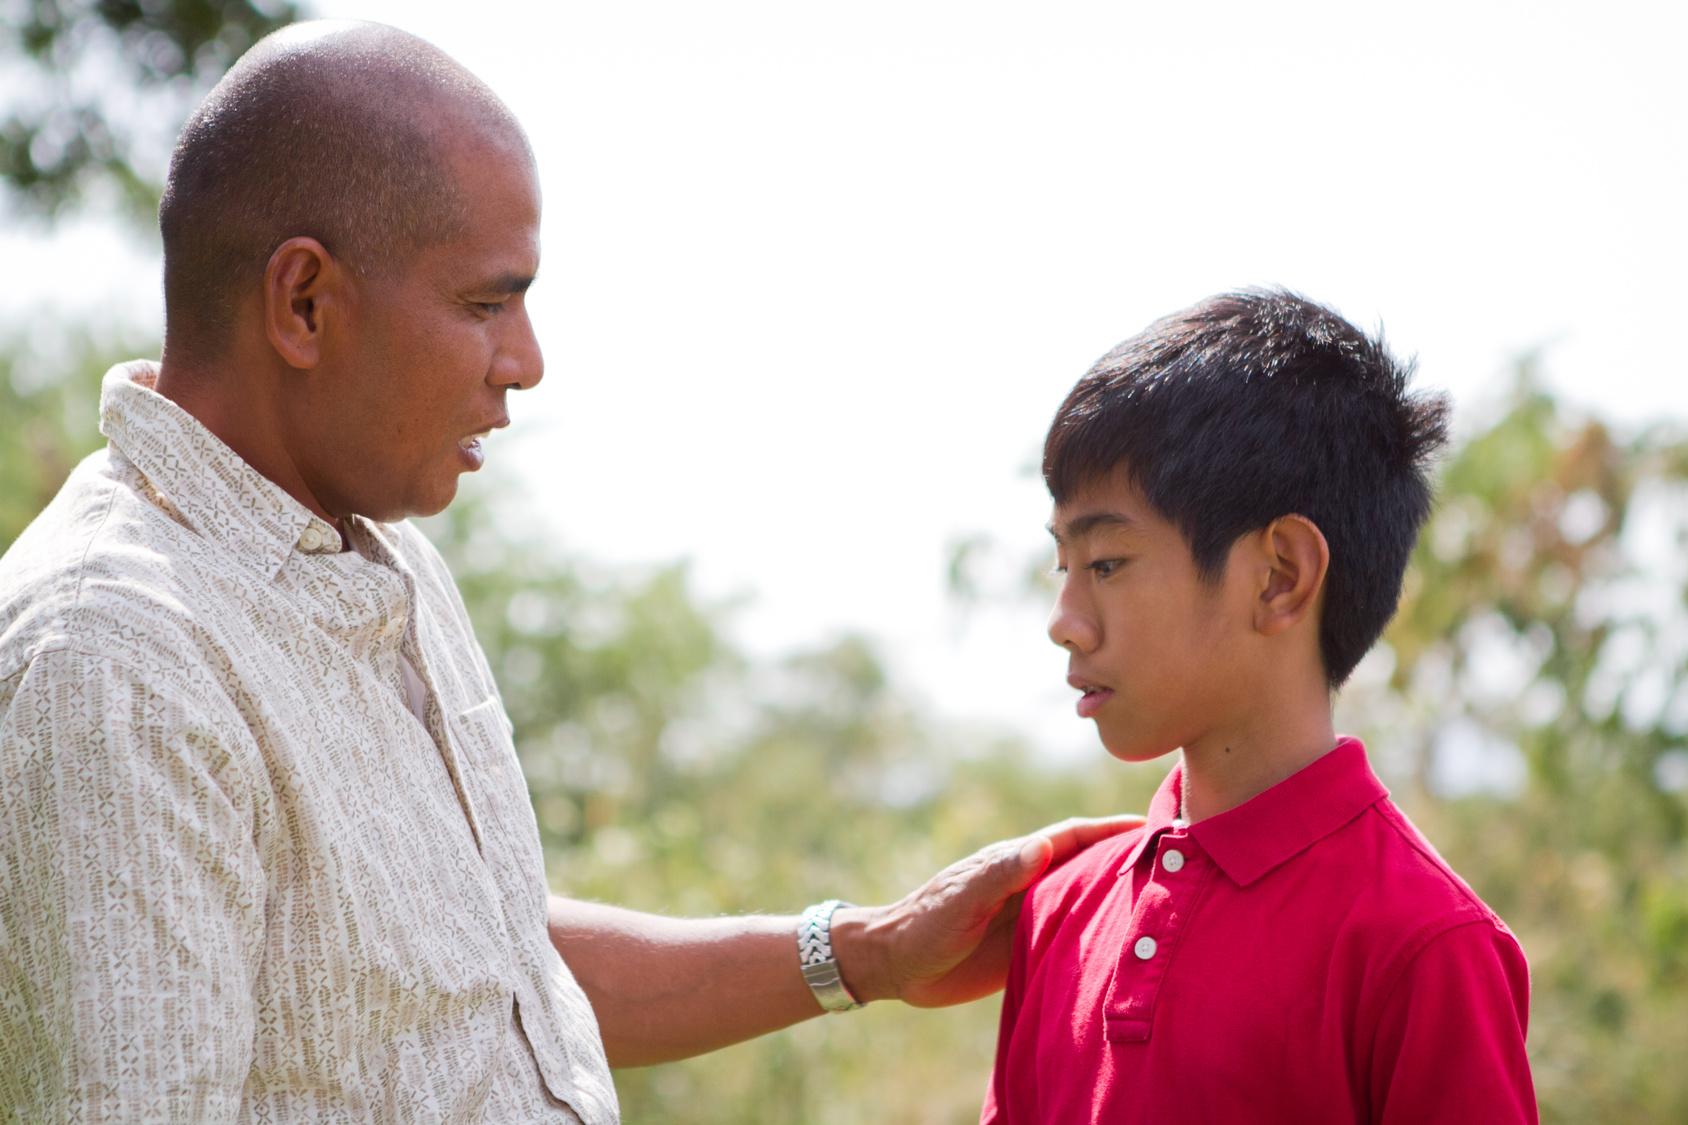 Parents, News, Tips, Social Emotional Learning, Summer Camp